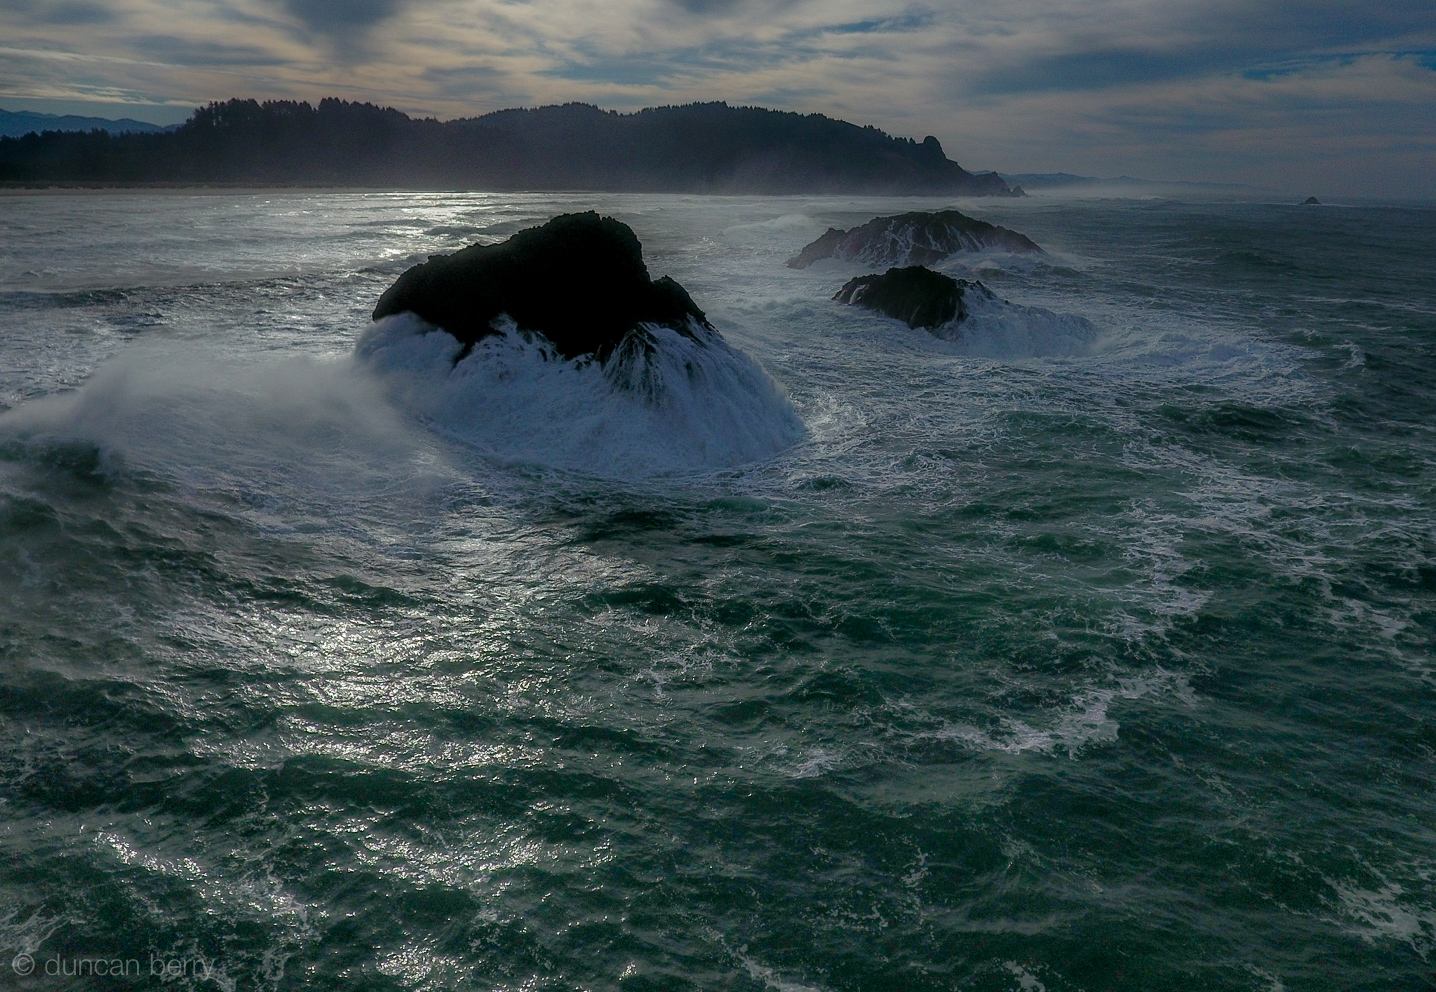 Three rocks with huges waves crashing